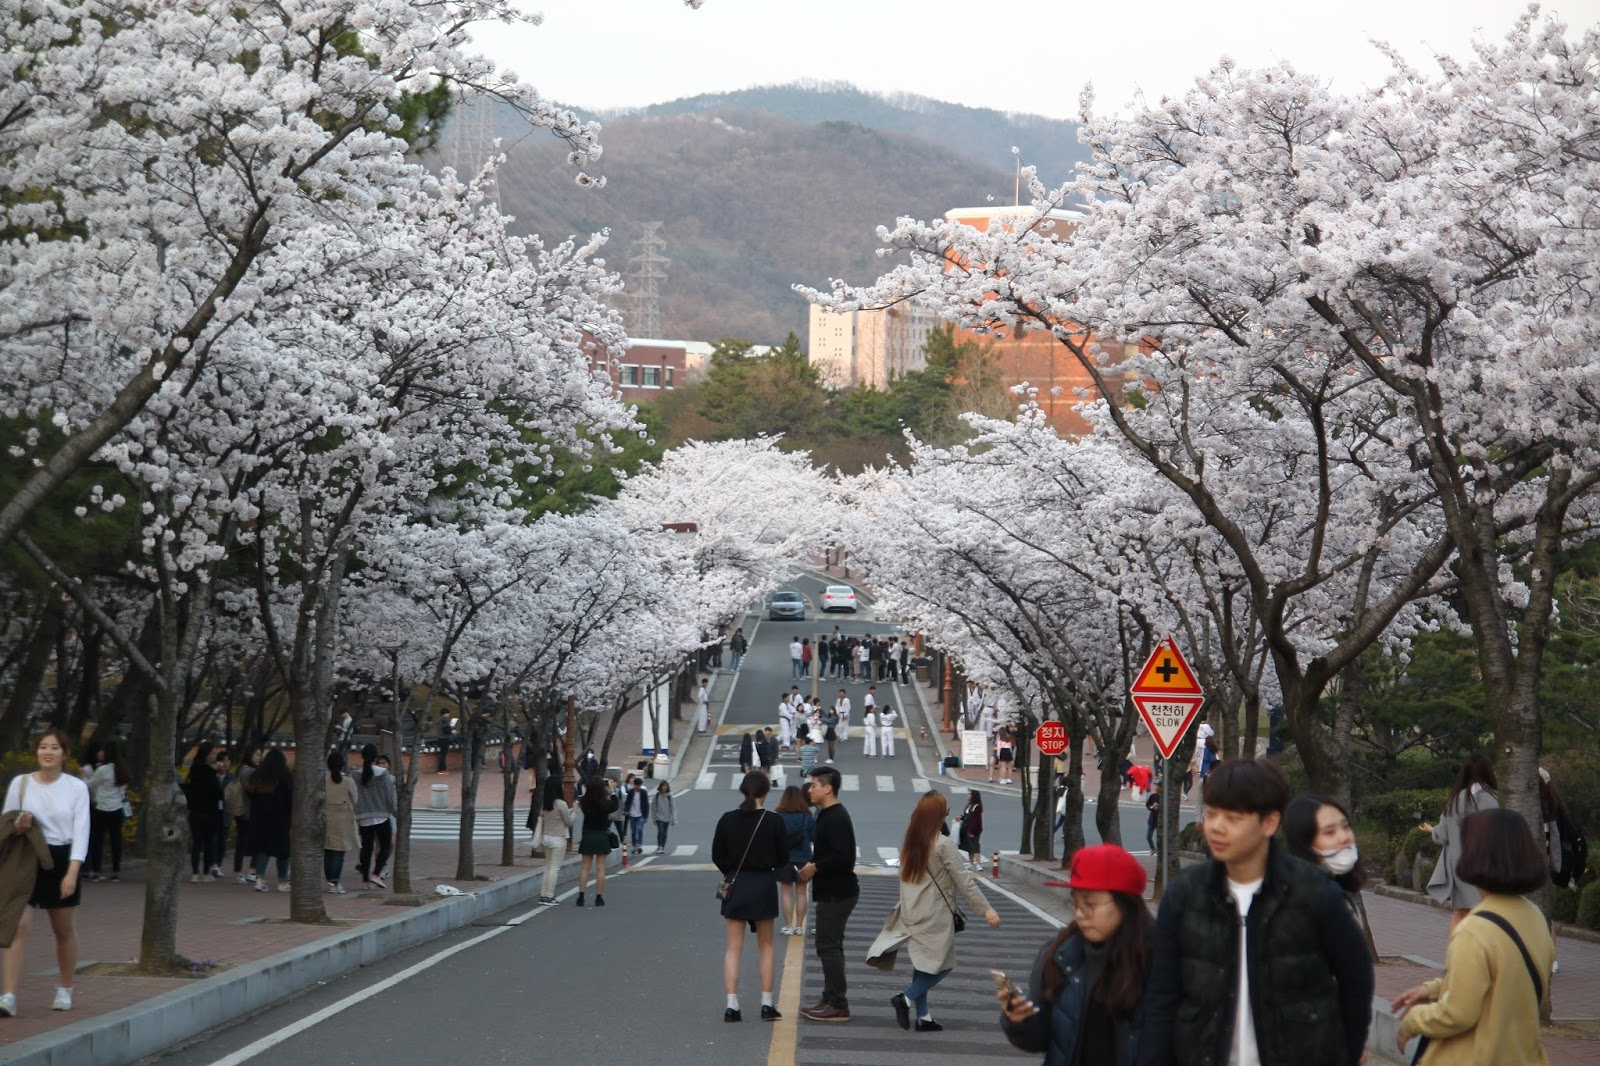 Cherry blossoms got a big phat apple bottom booty - 3 part 2